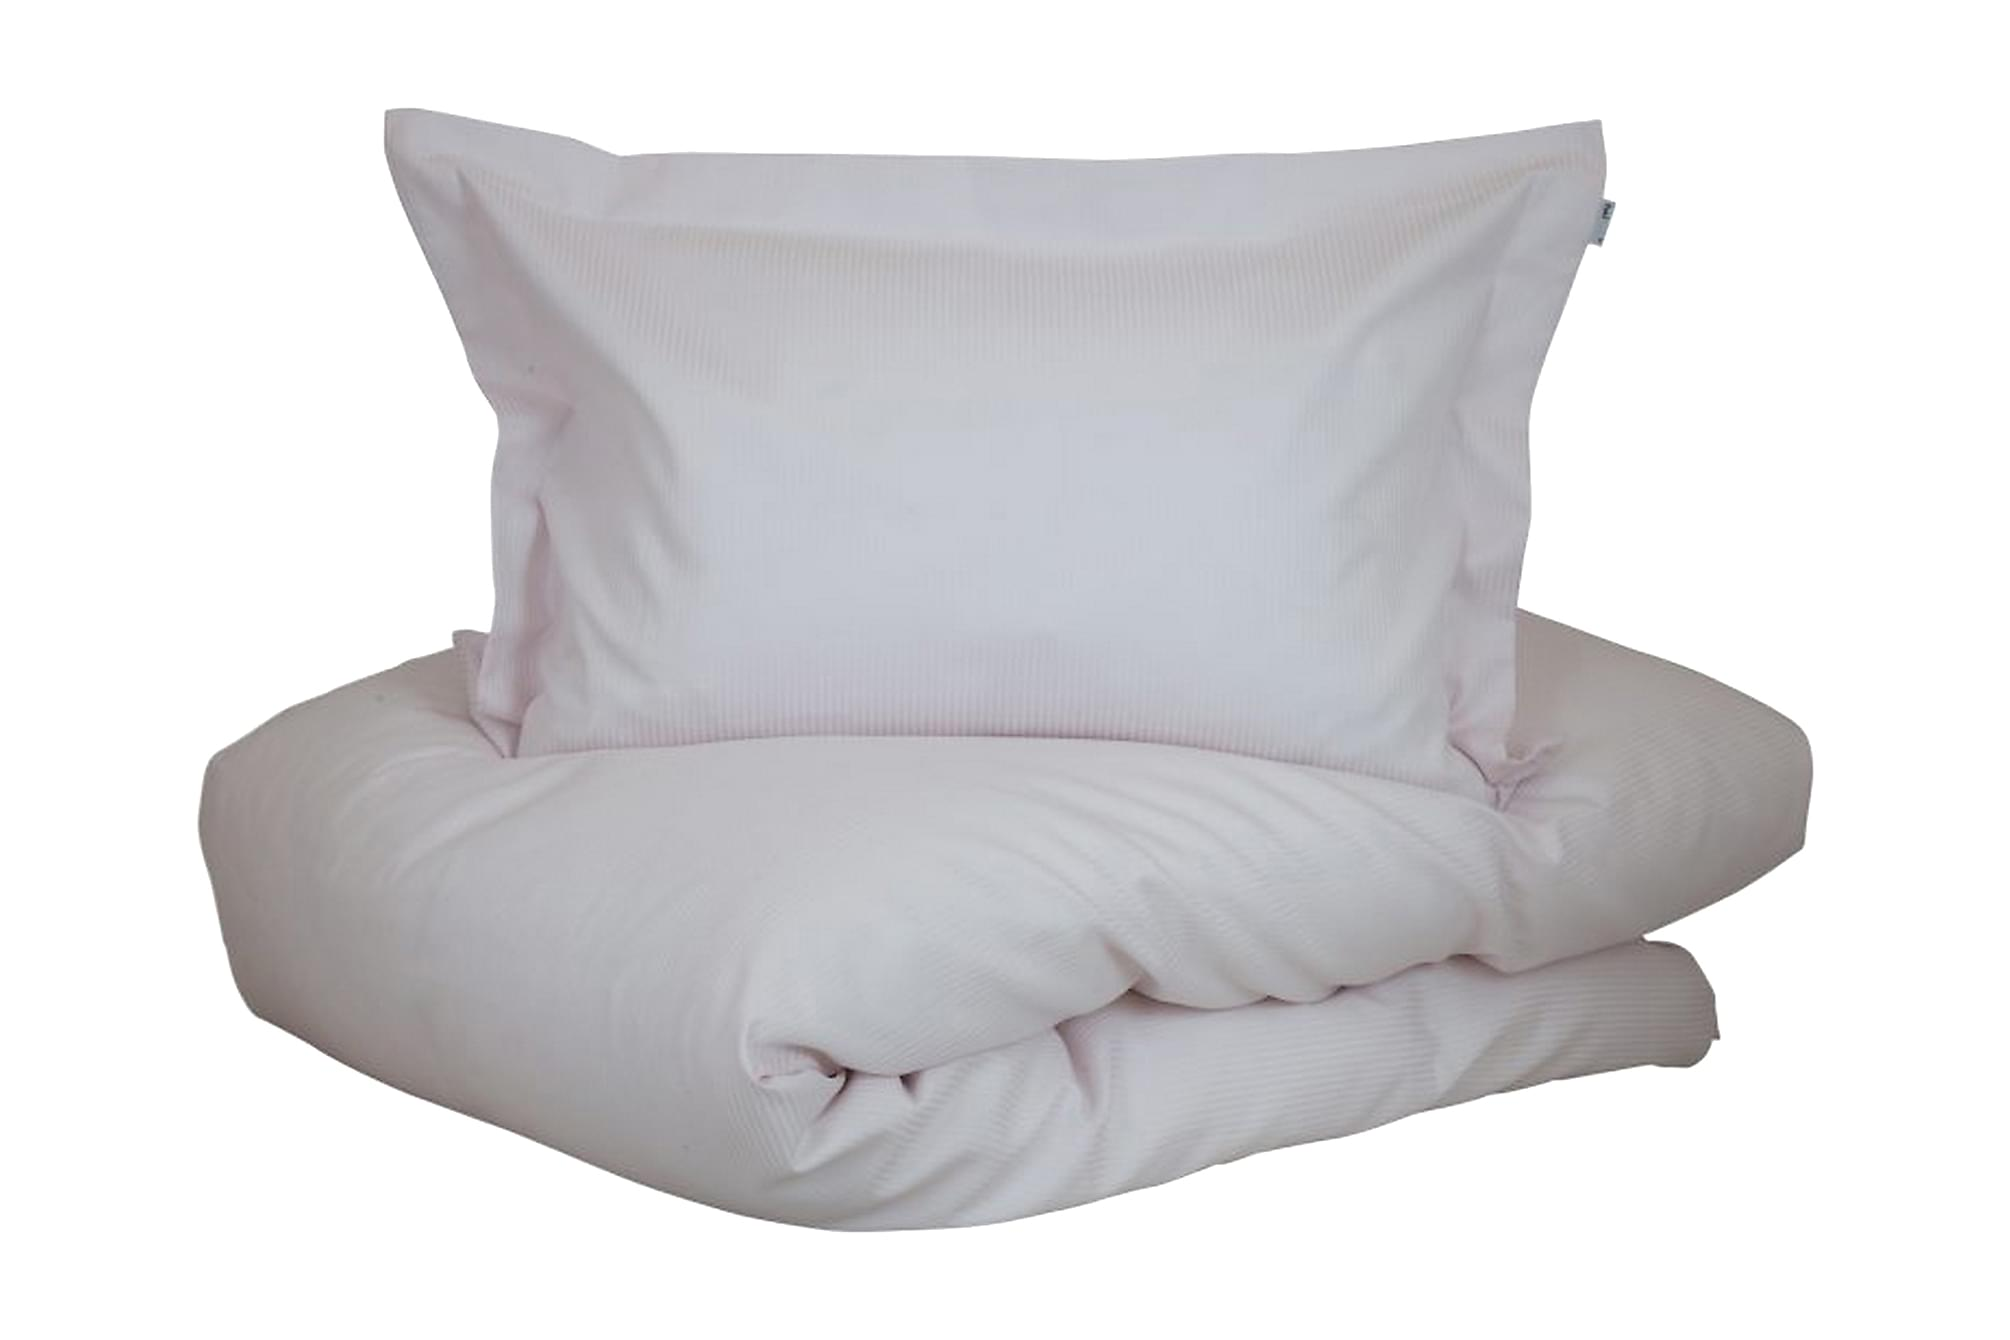 ALDERNEY Bäddset 150x210 cm Satin Rosa, Sängkläder